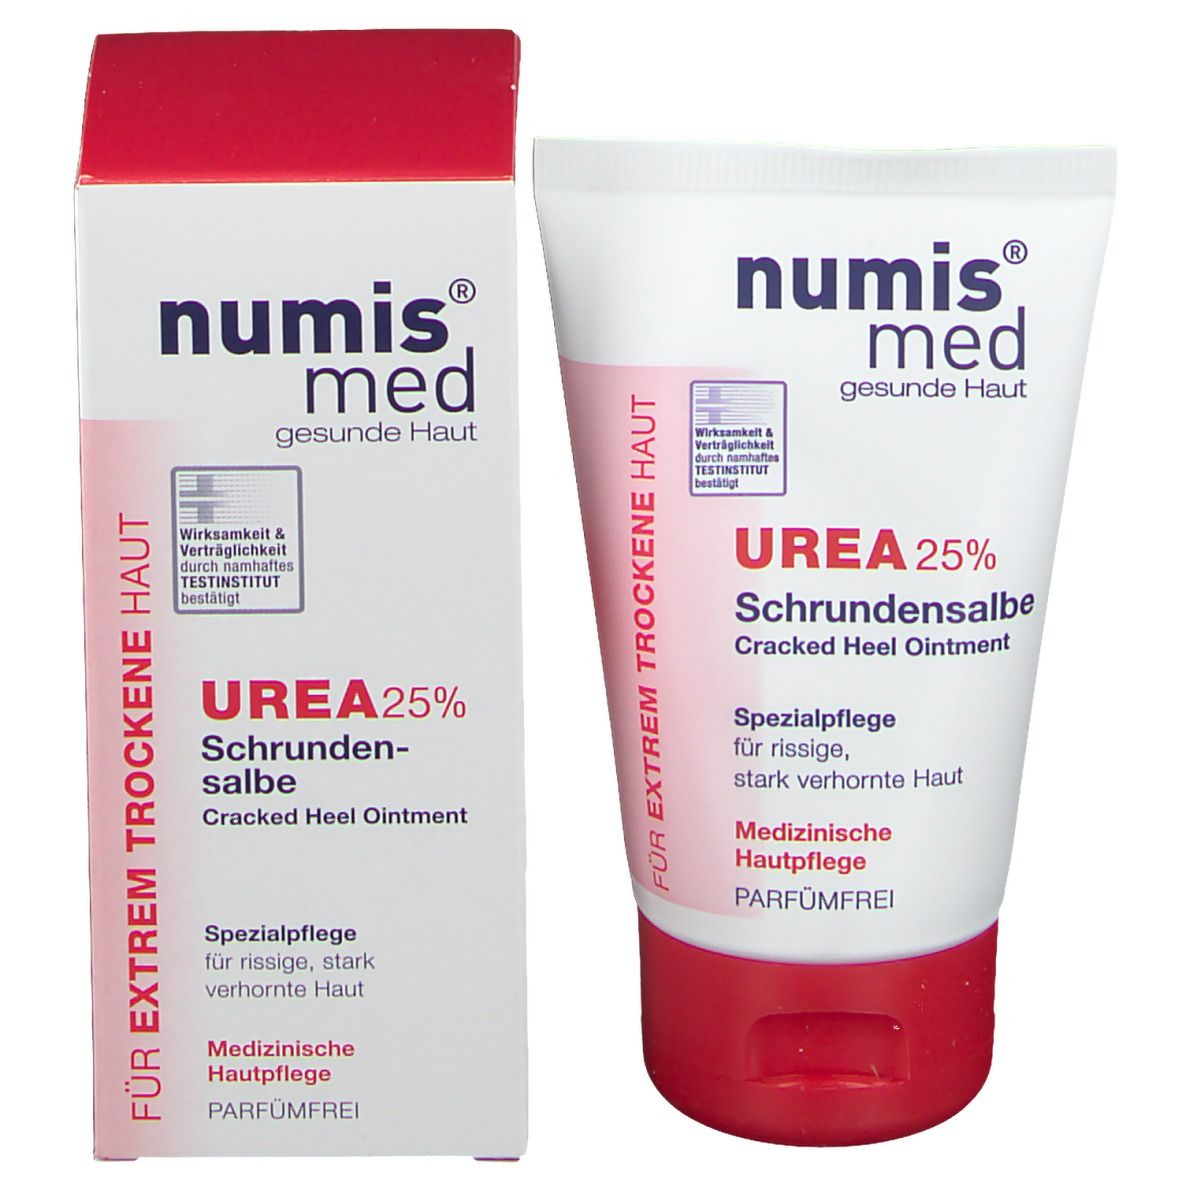 numis® med UREA 25% Schrundensalbe